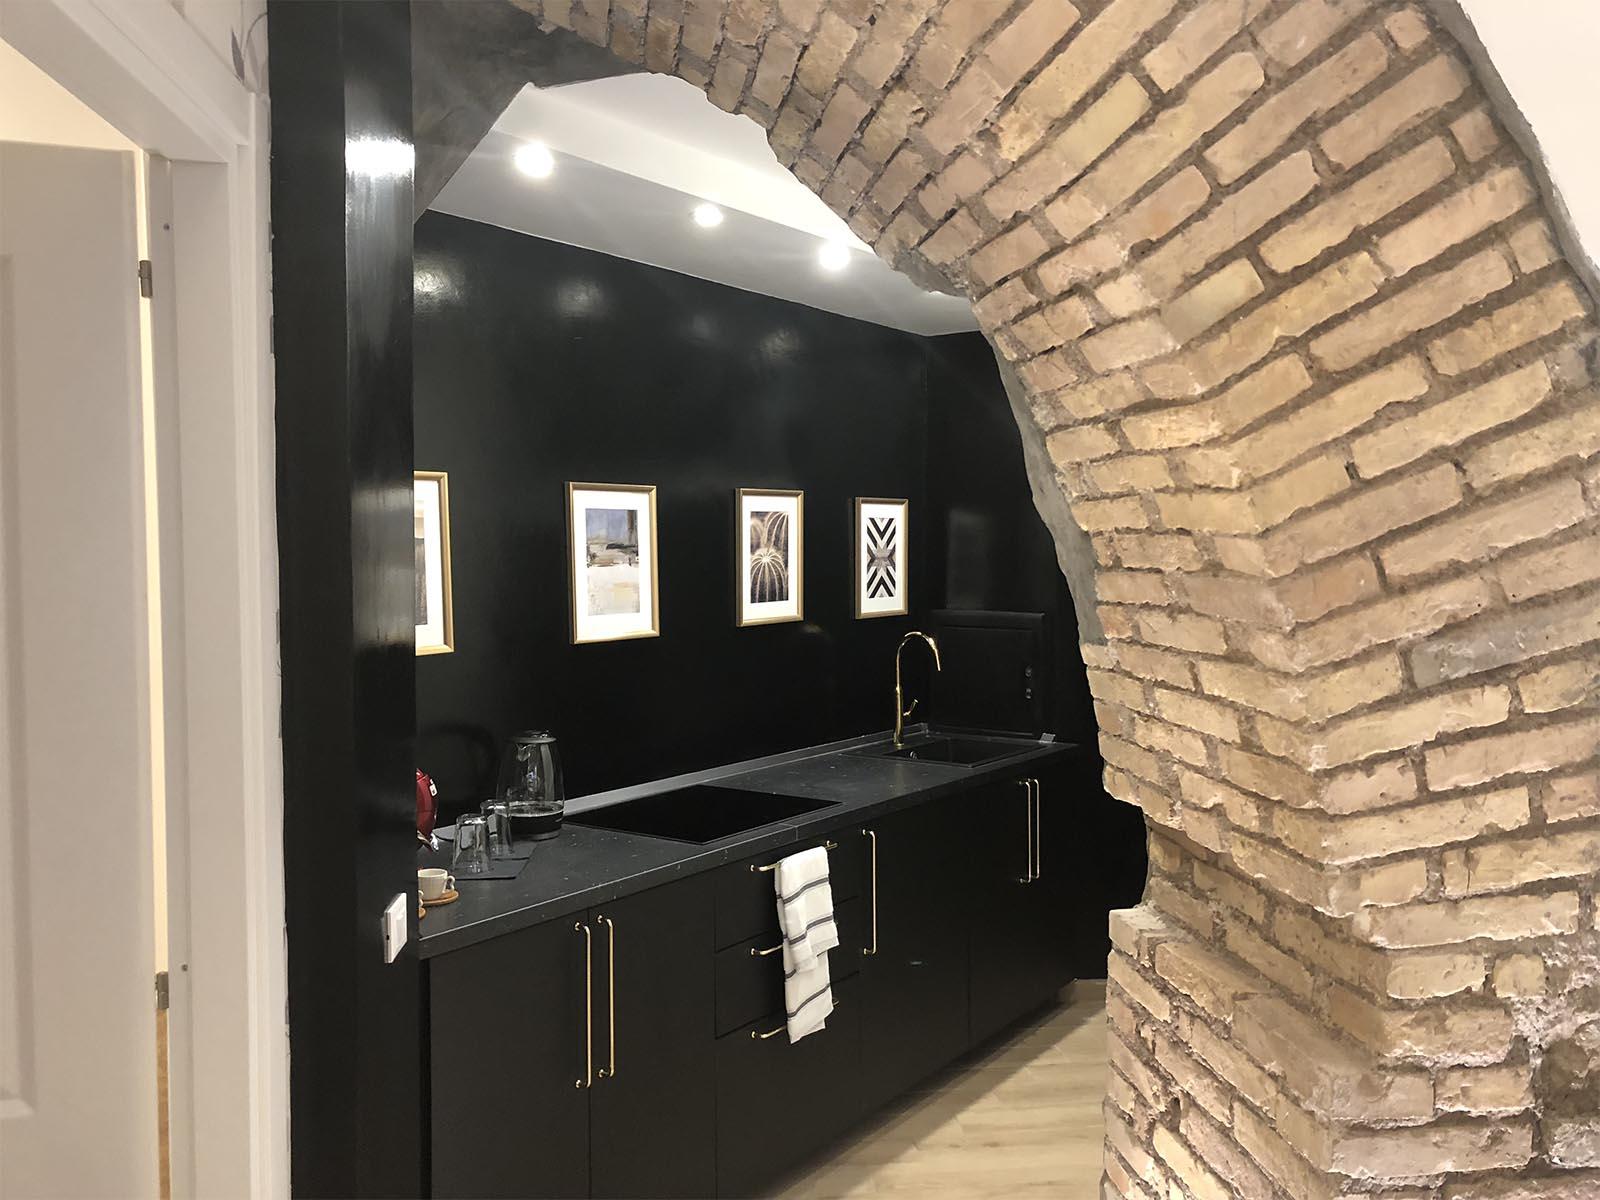 Giolitti Suite Interior 4